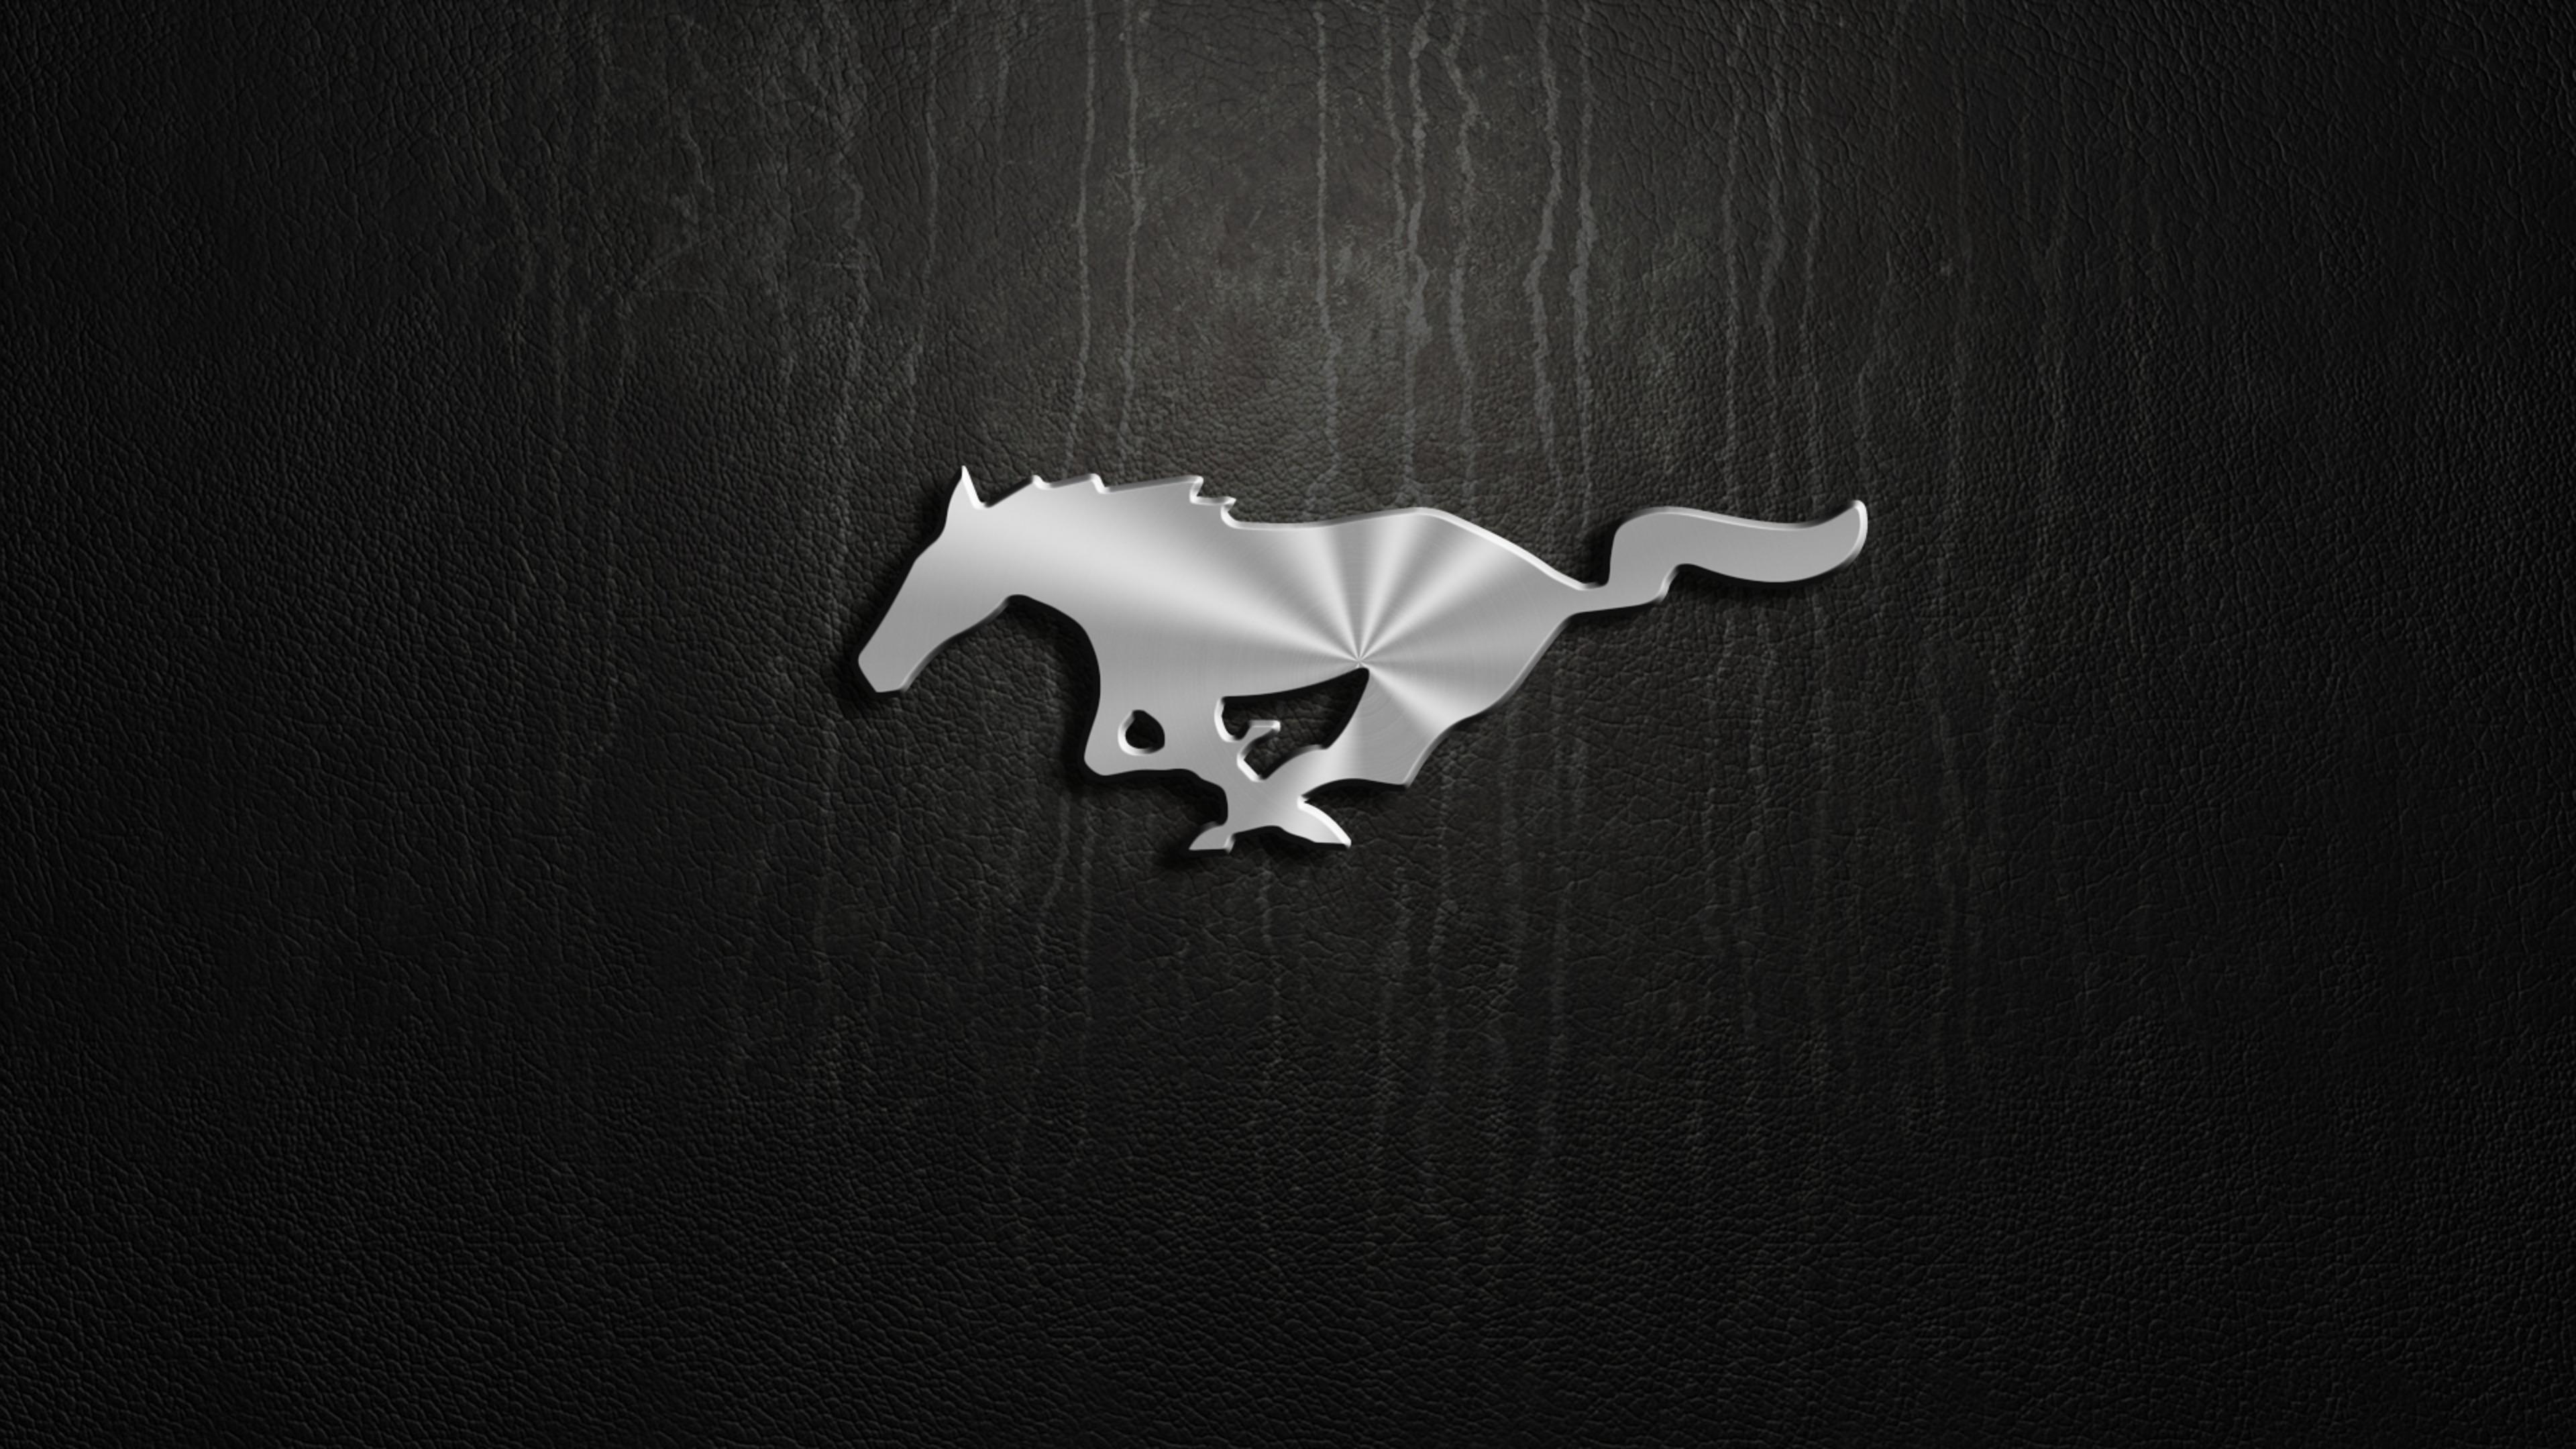 ford-logo-qhd.jpg